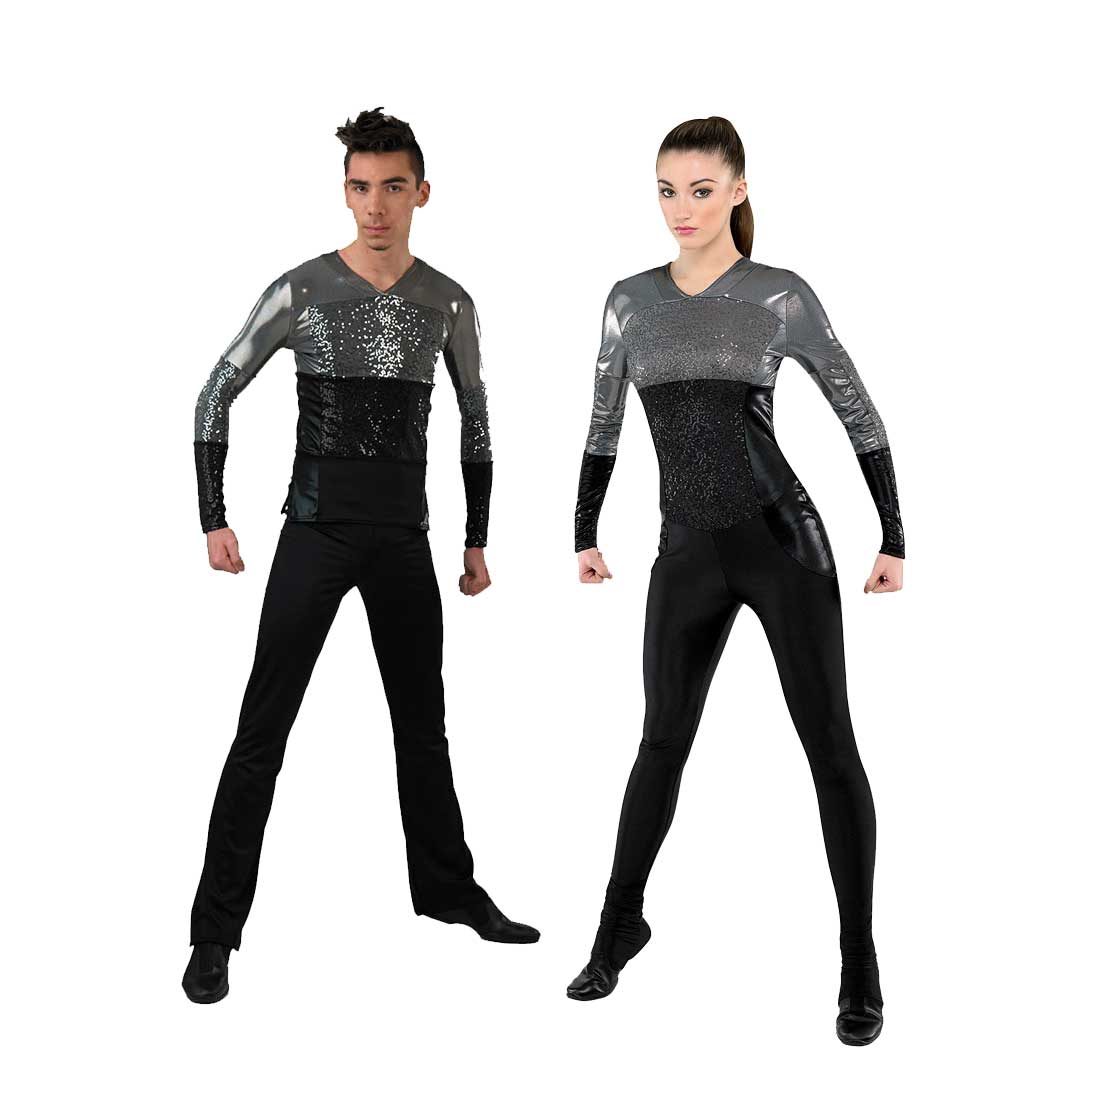 Guard Uniforms: Style 15004